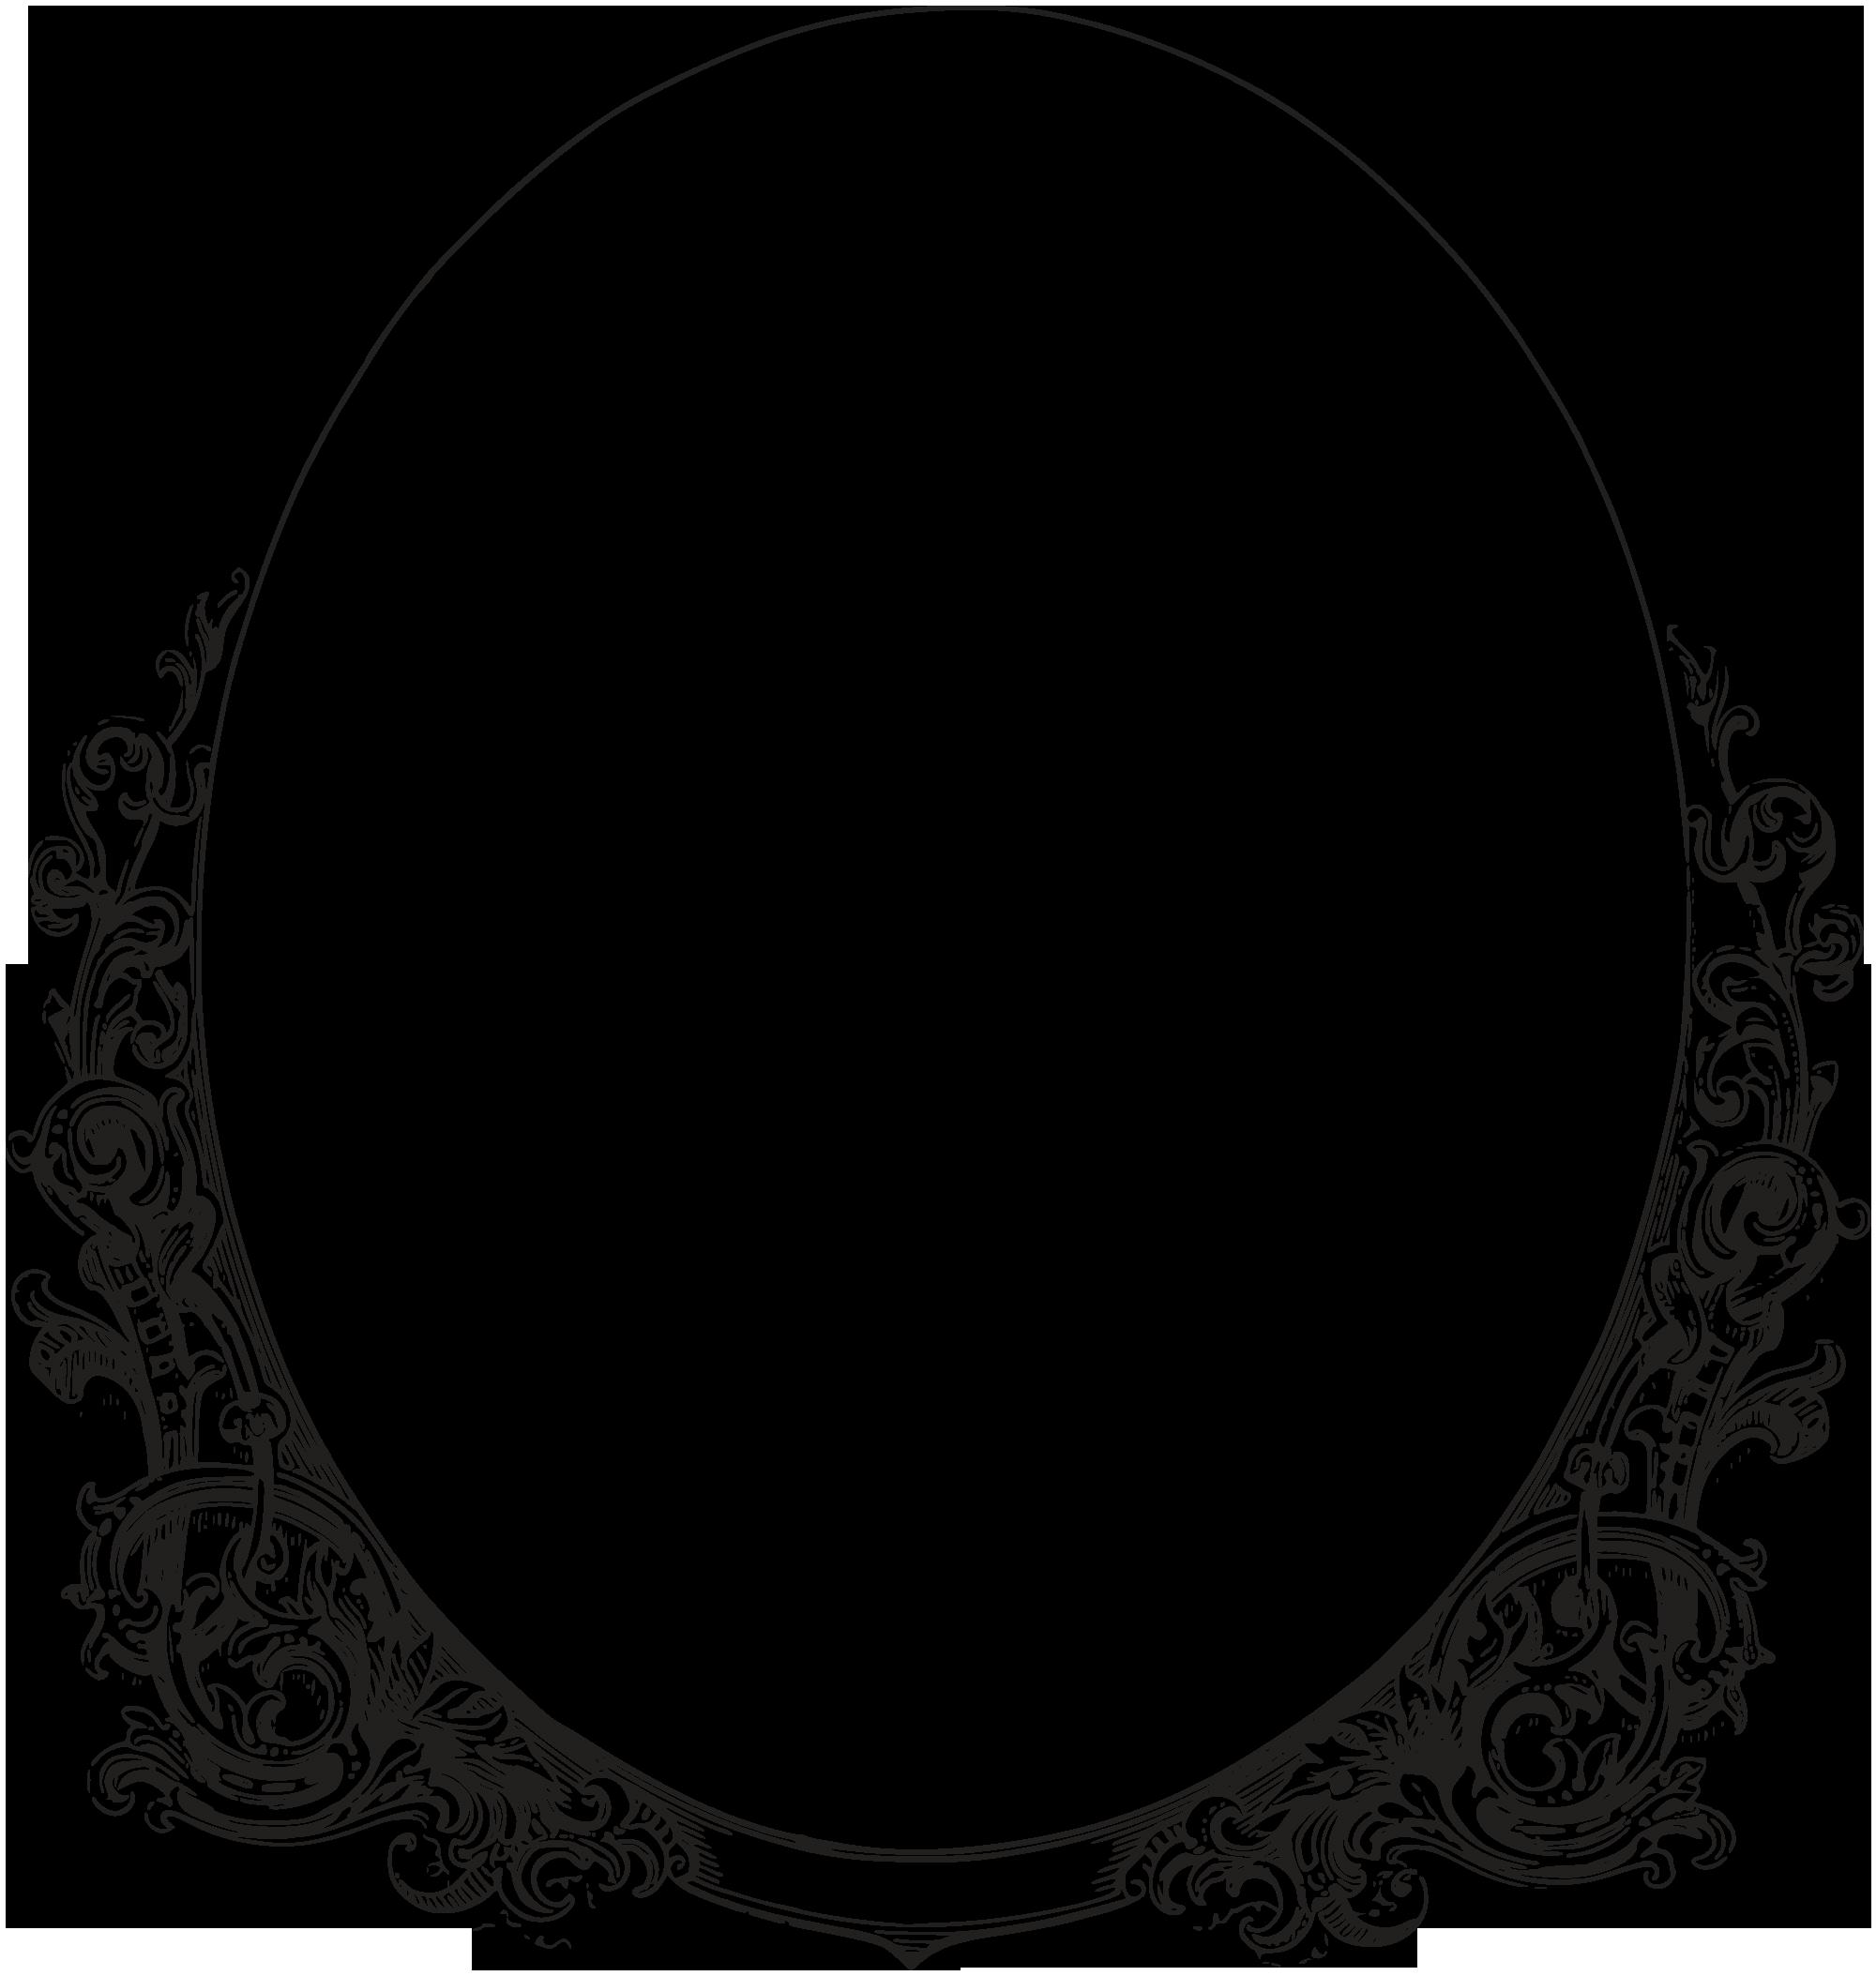 clip art oval frames free - photo #16